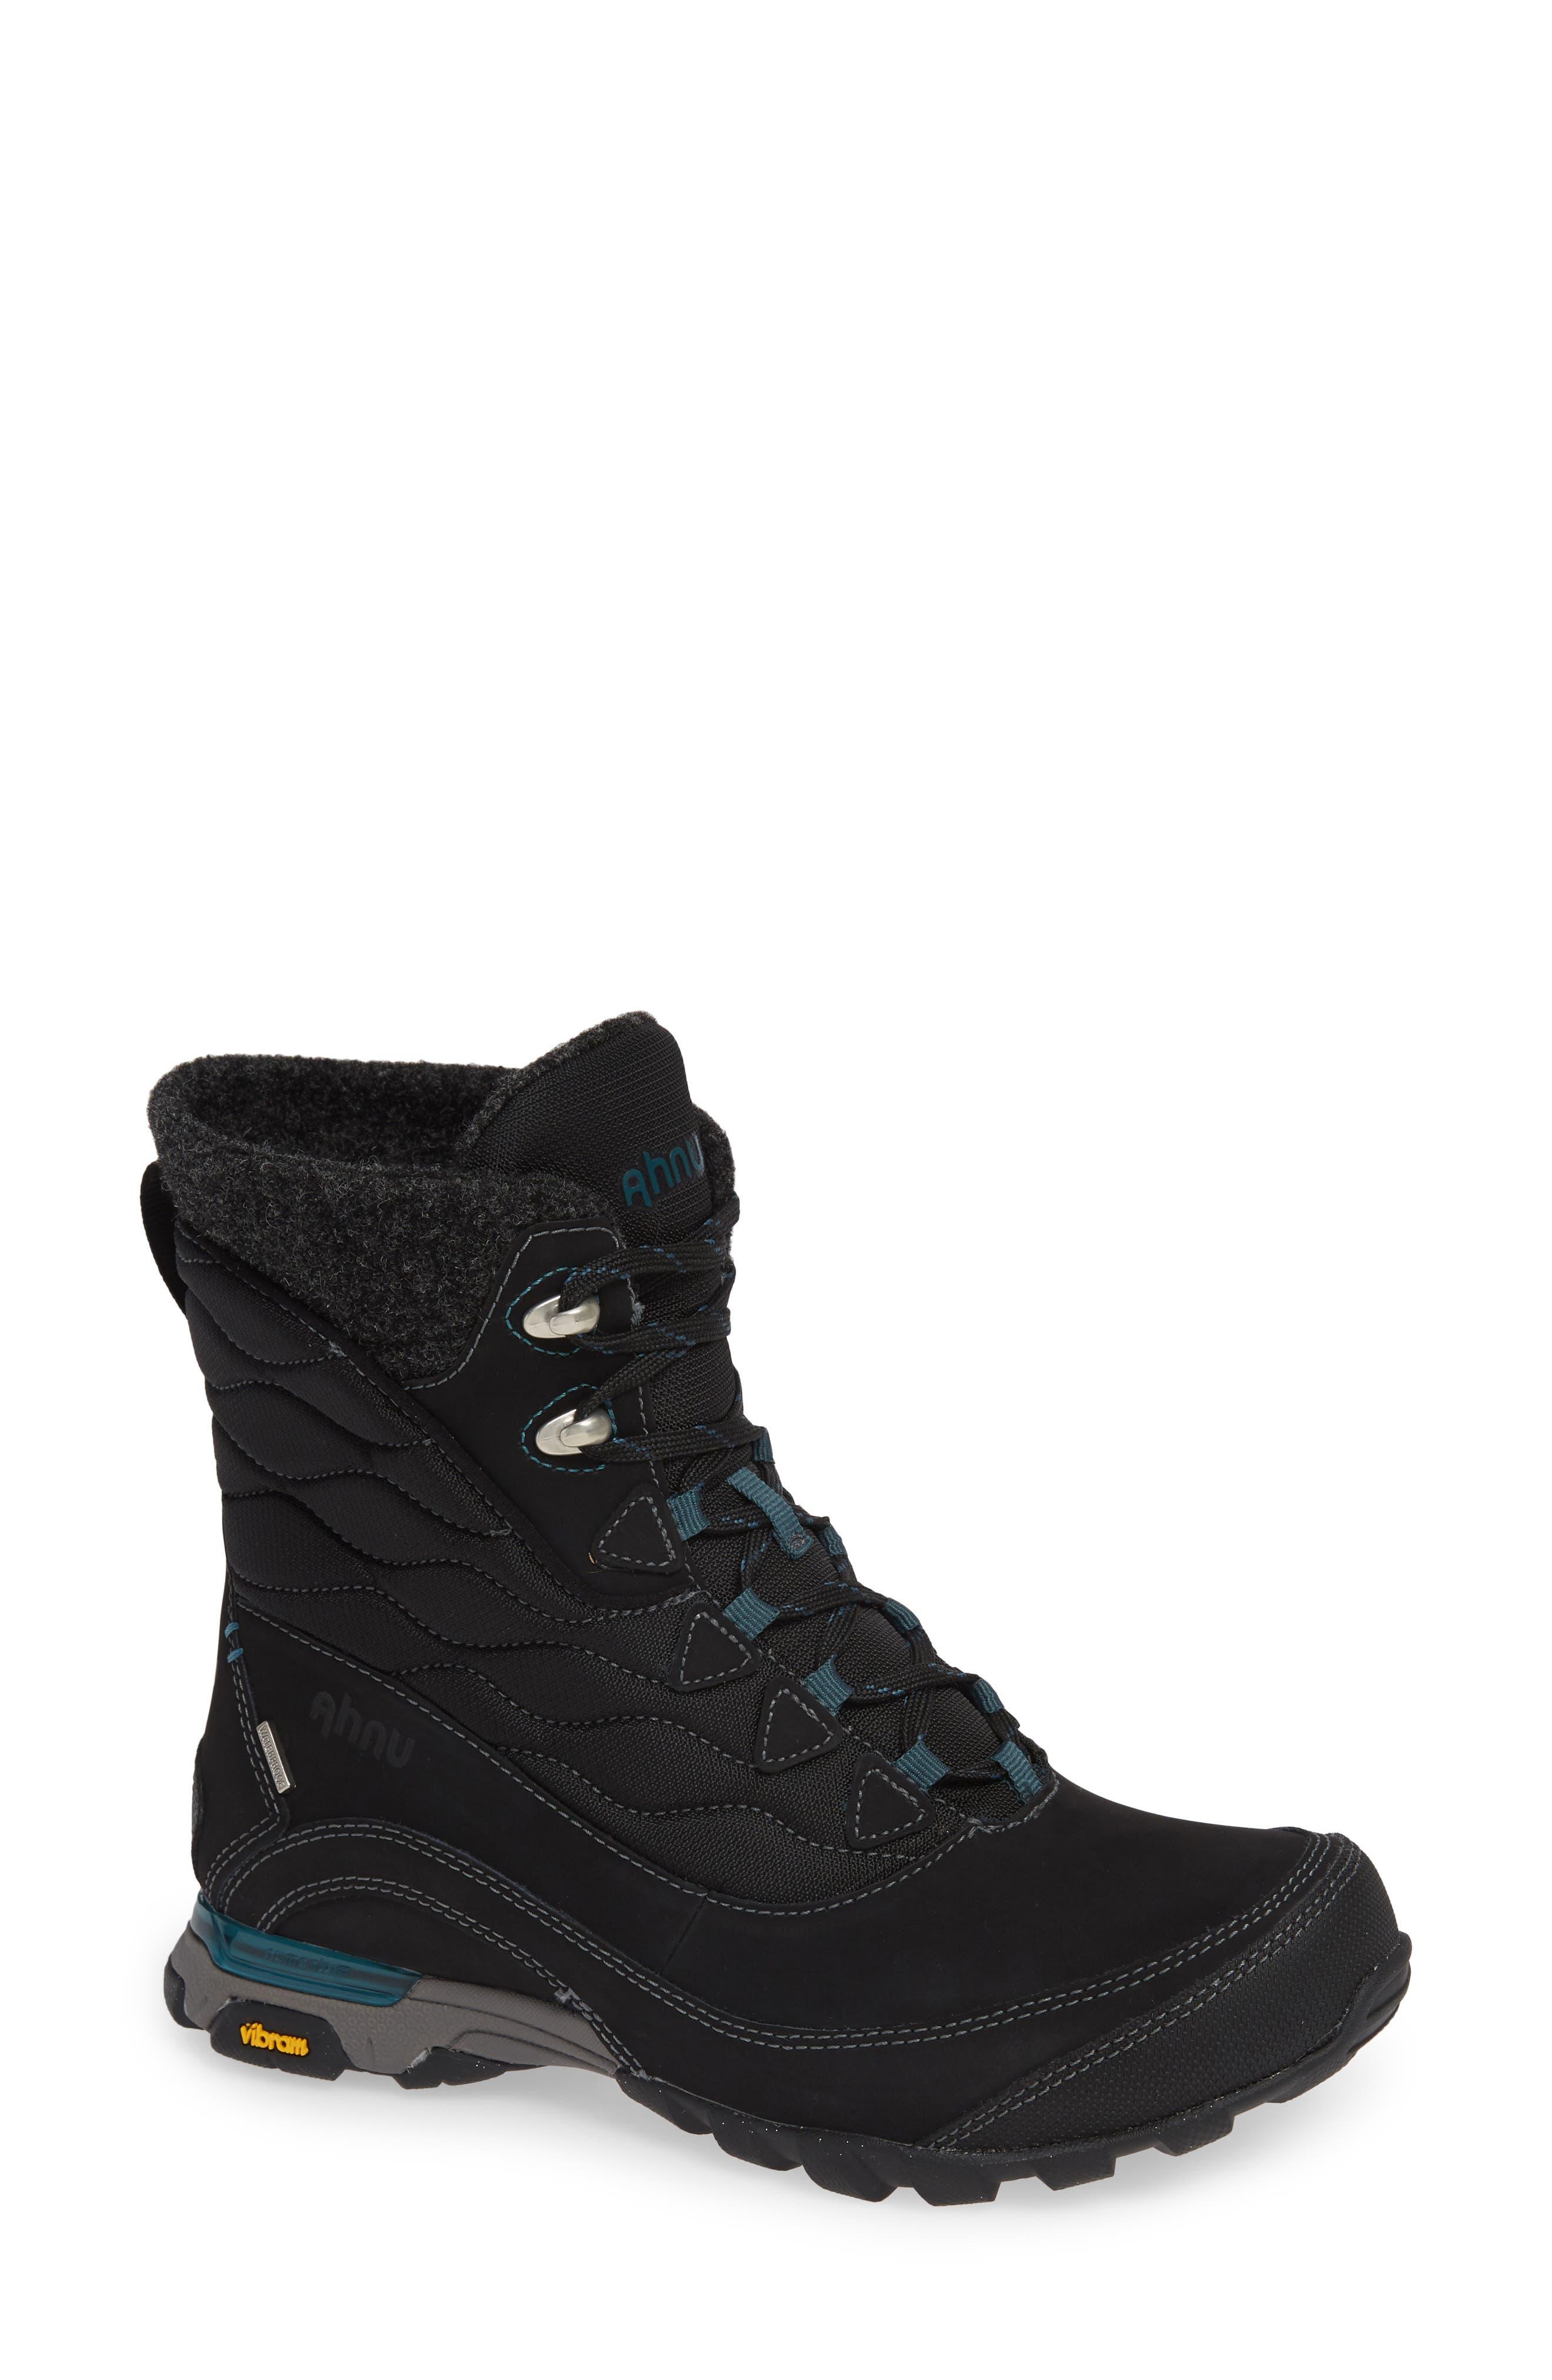 TEVA, Ahnu by Teva Sugarfrost Insulated Waterproof Boot, Main thumbnail 1, color, BLACK LEATHER